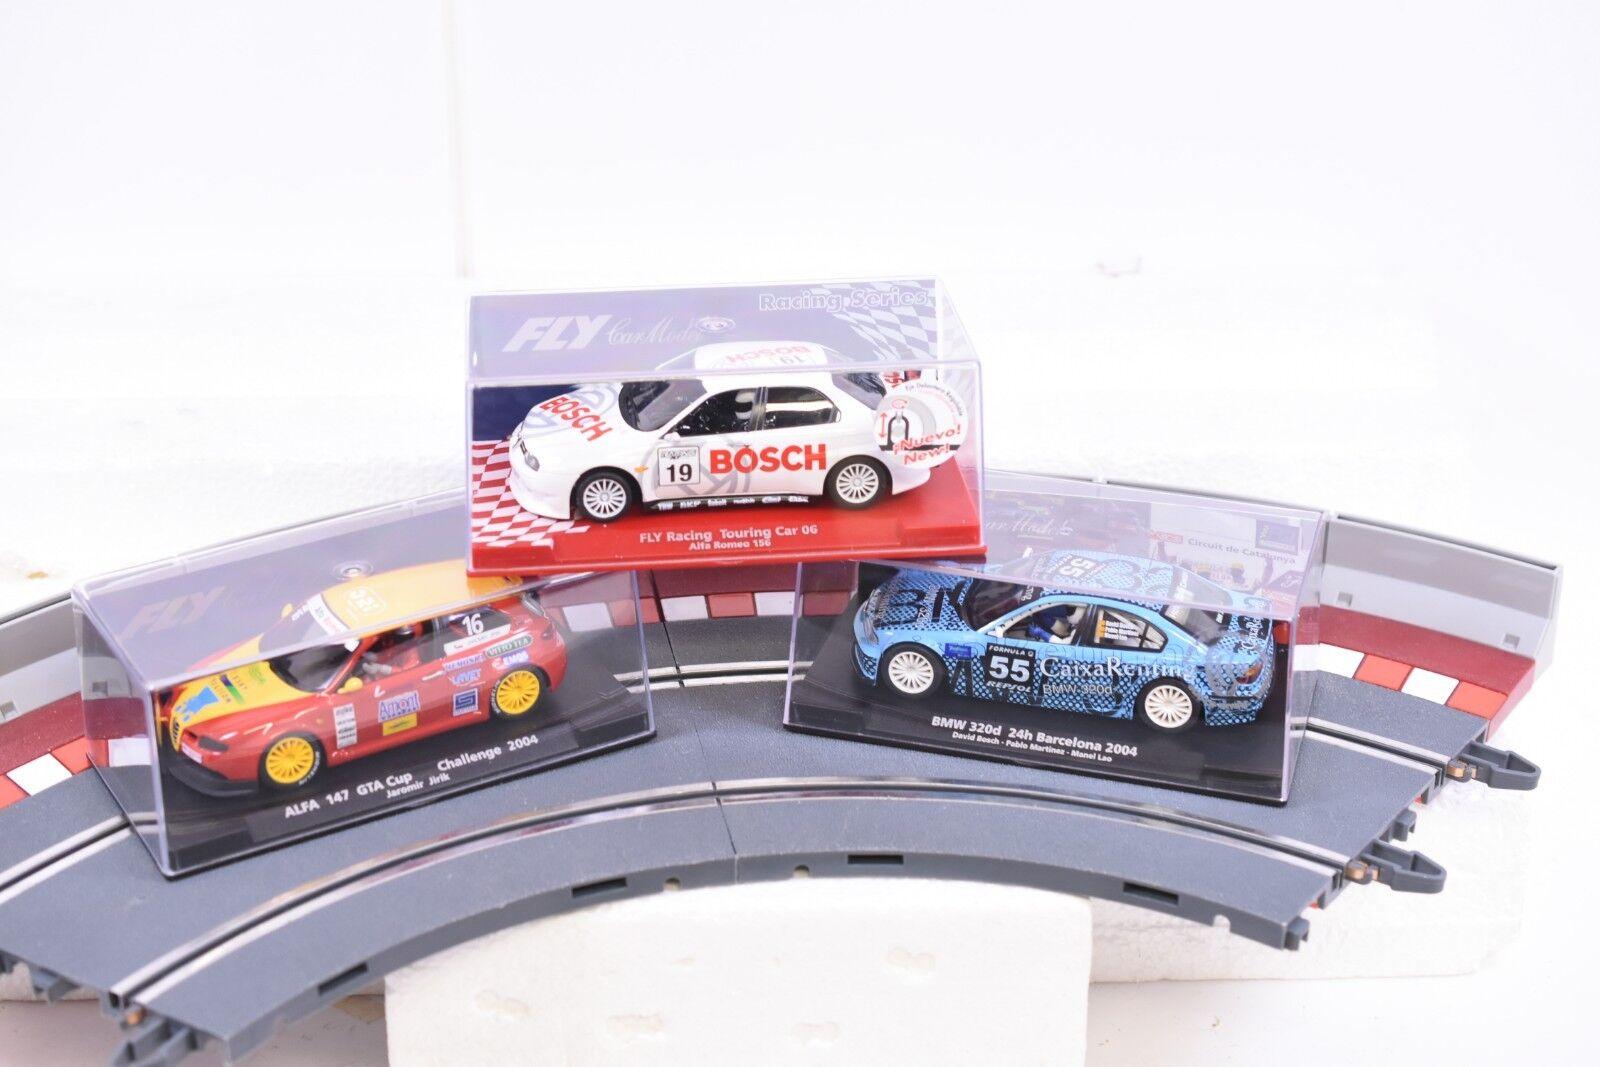 Misc Lote de Volar 1 32 Slot Cars 3 Cars, 88197 +88244 +88157 Afla + BMW 320d